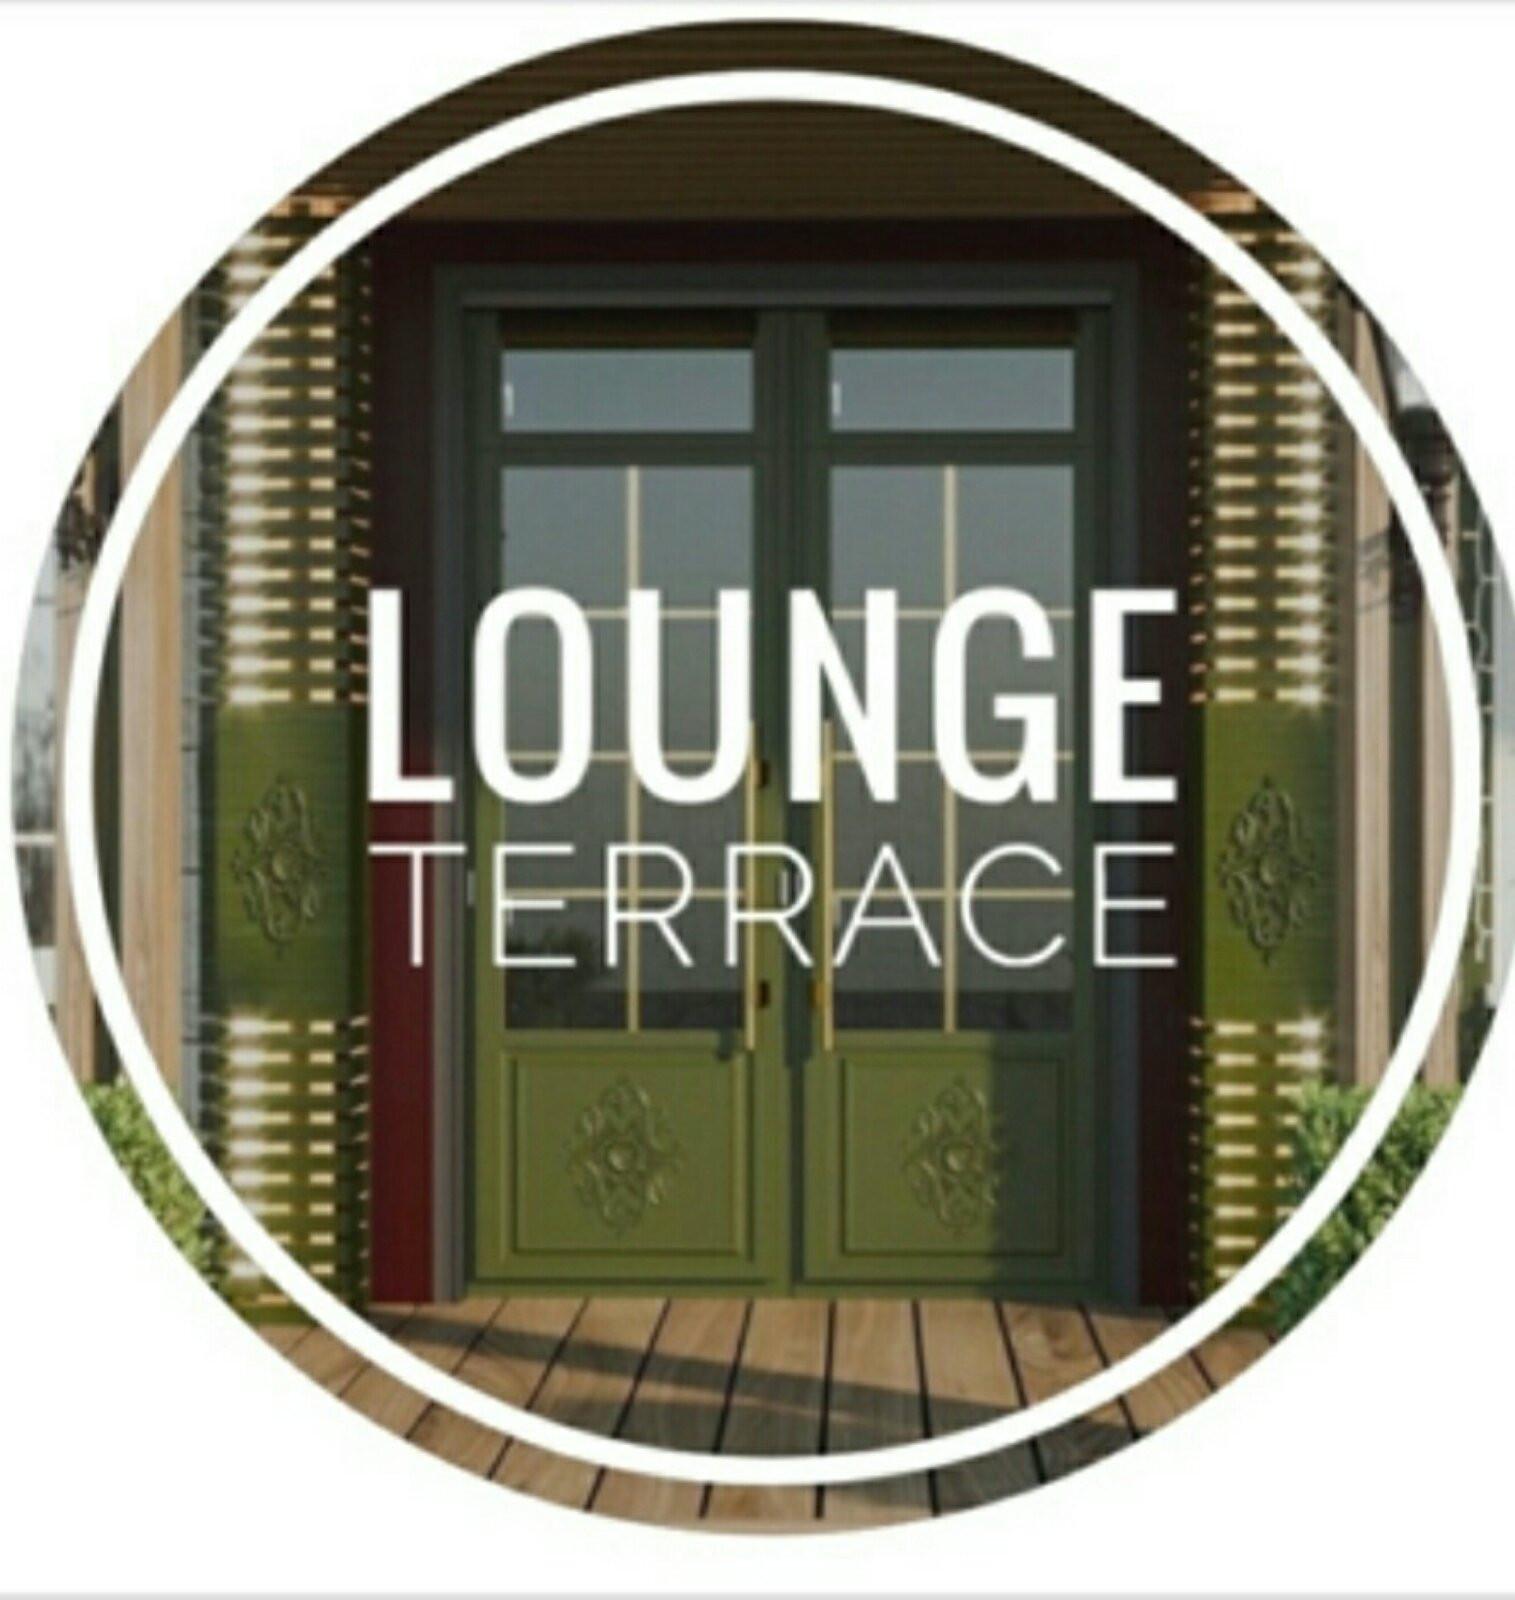 Логотип заведения  Lounge Terrace (Лаунж Терраса)